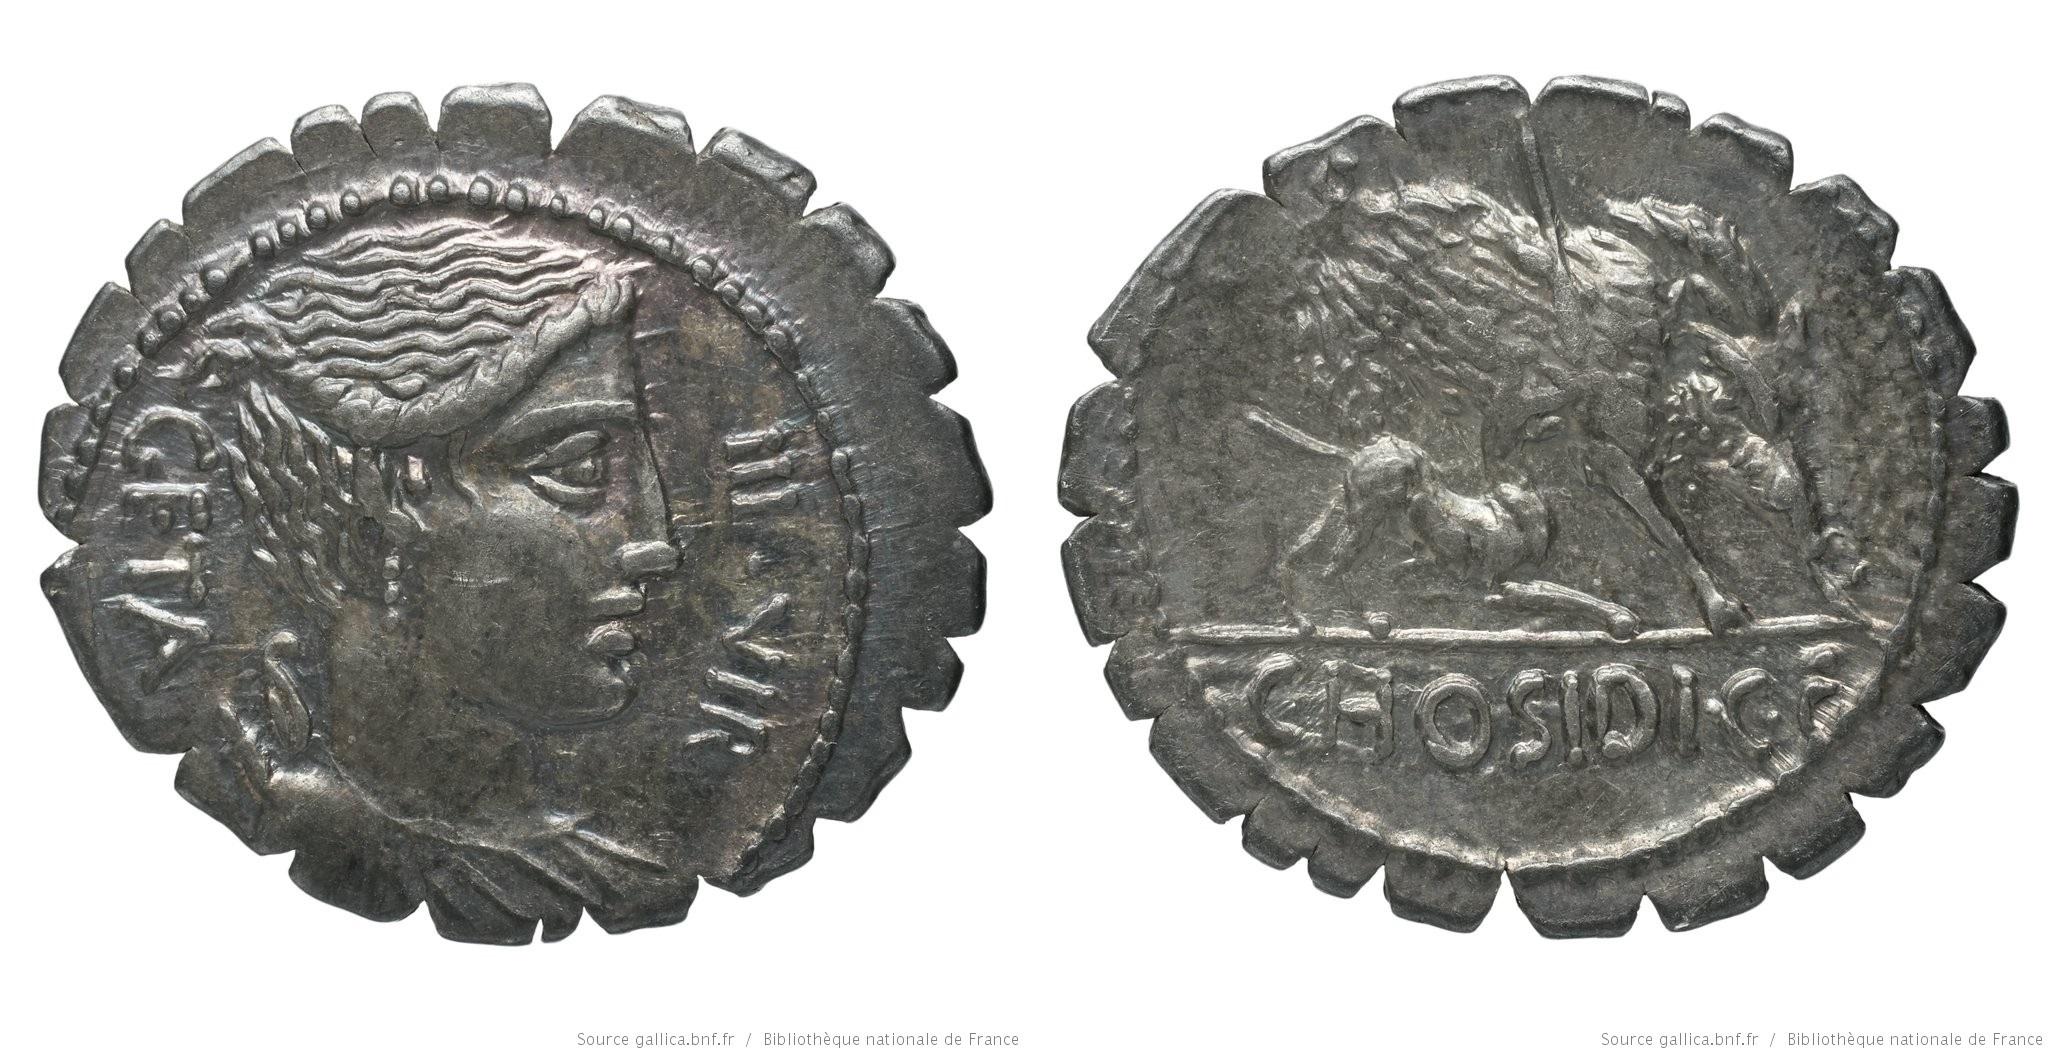 1355HO – Denier Serratus Hosidia – Caius Hosidius Geta